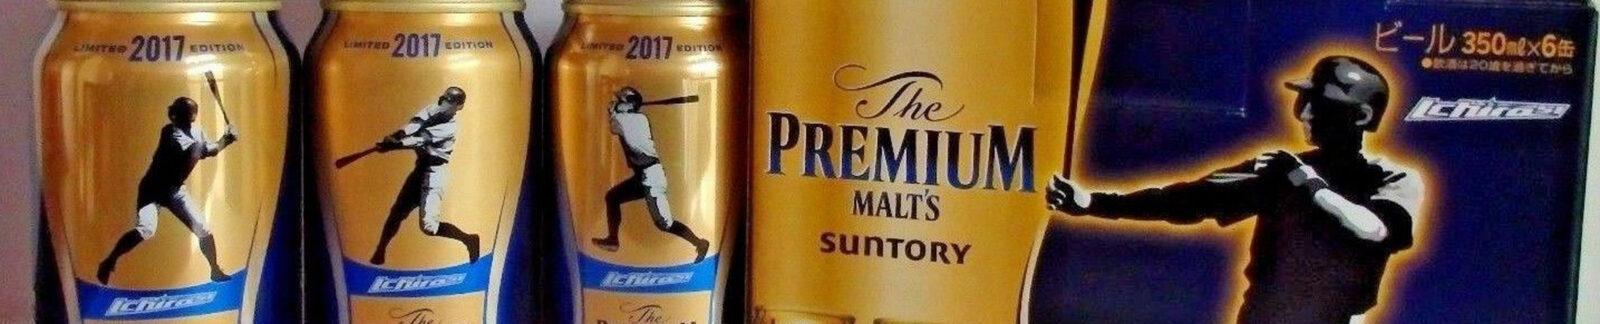 Ichiro Suzuki for The Premium Malts by Suntory header